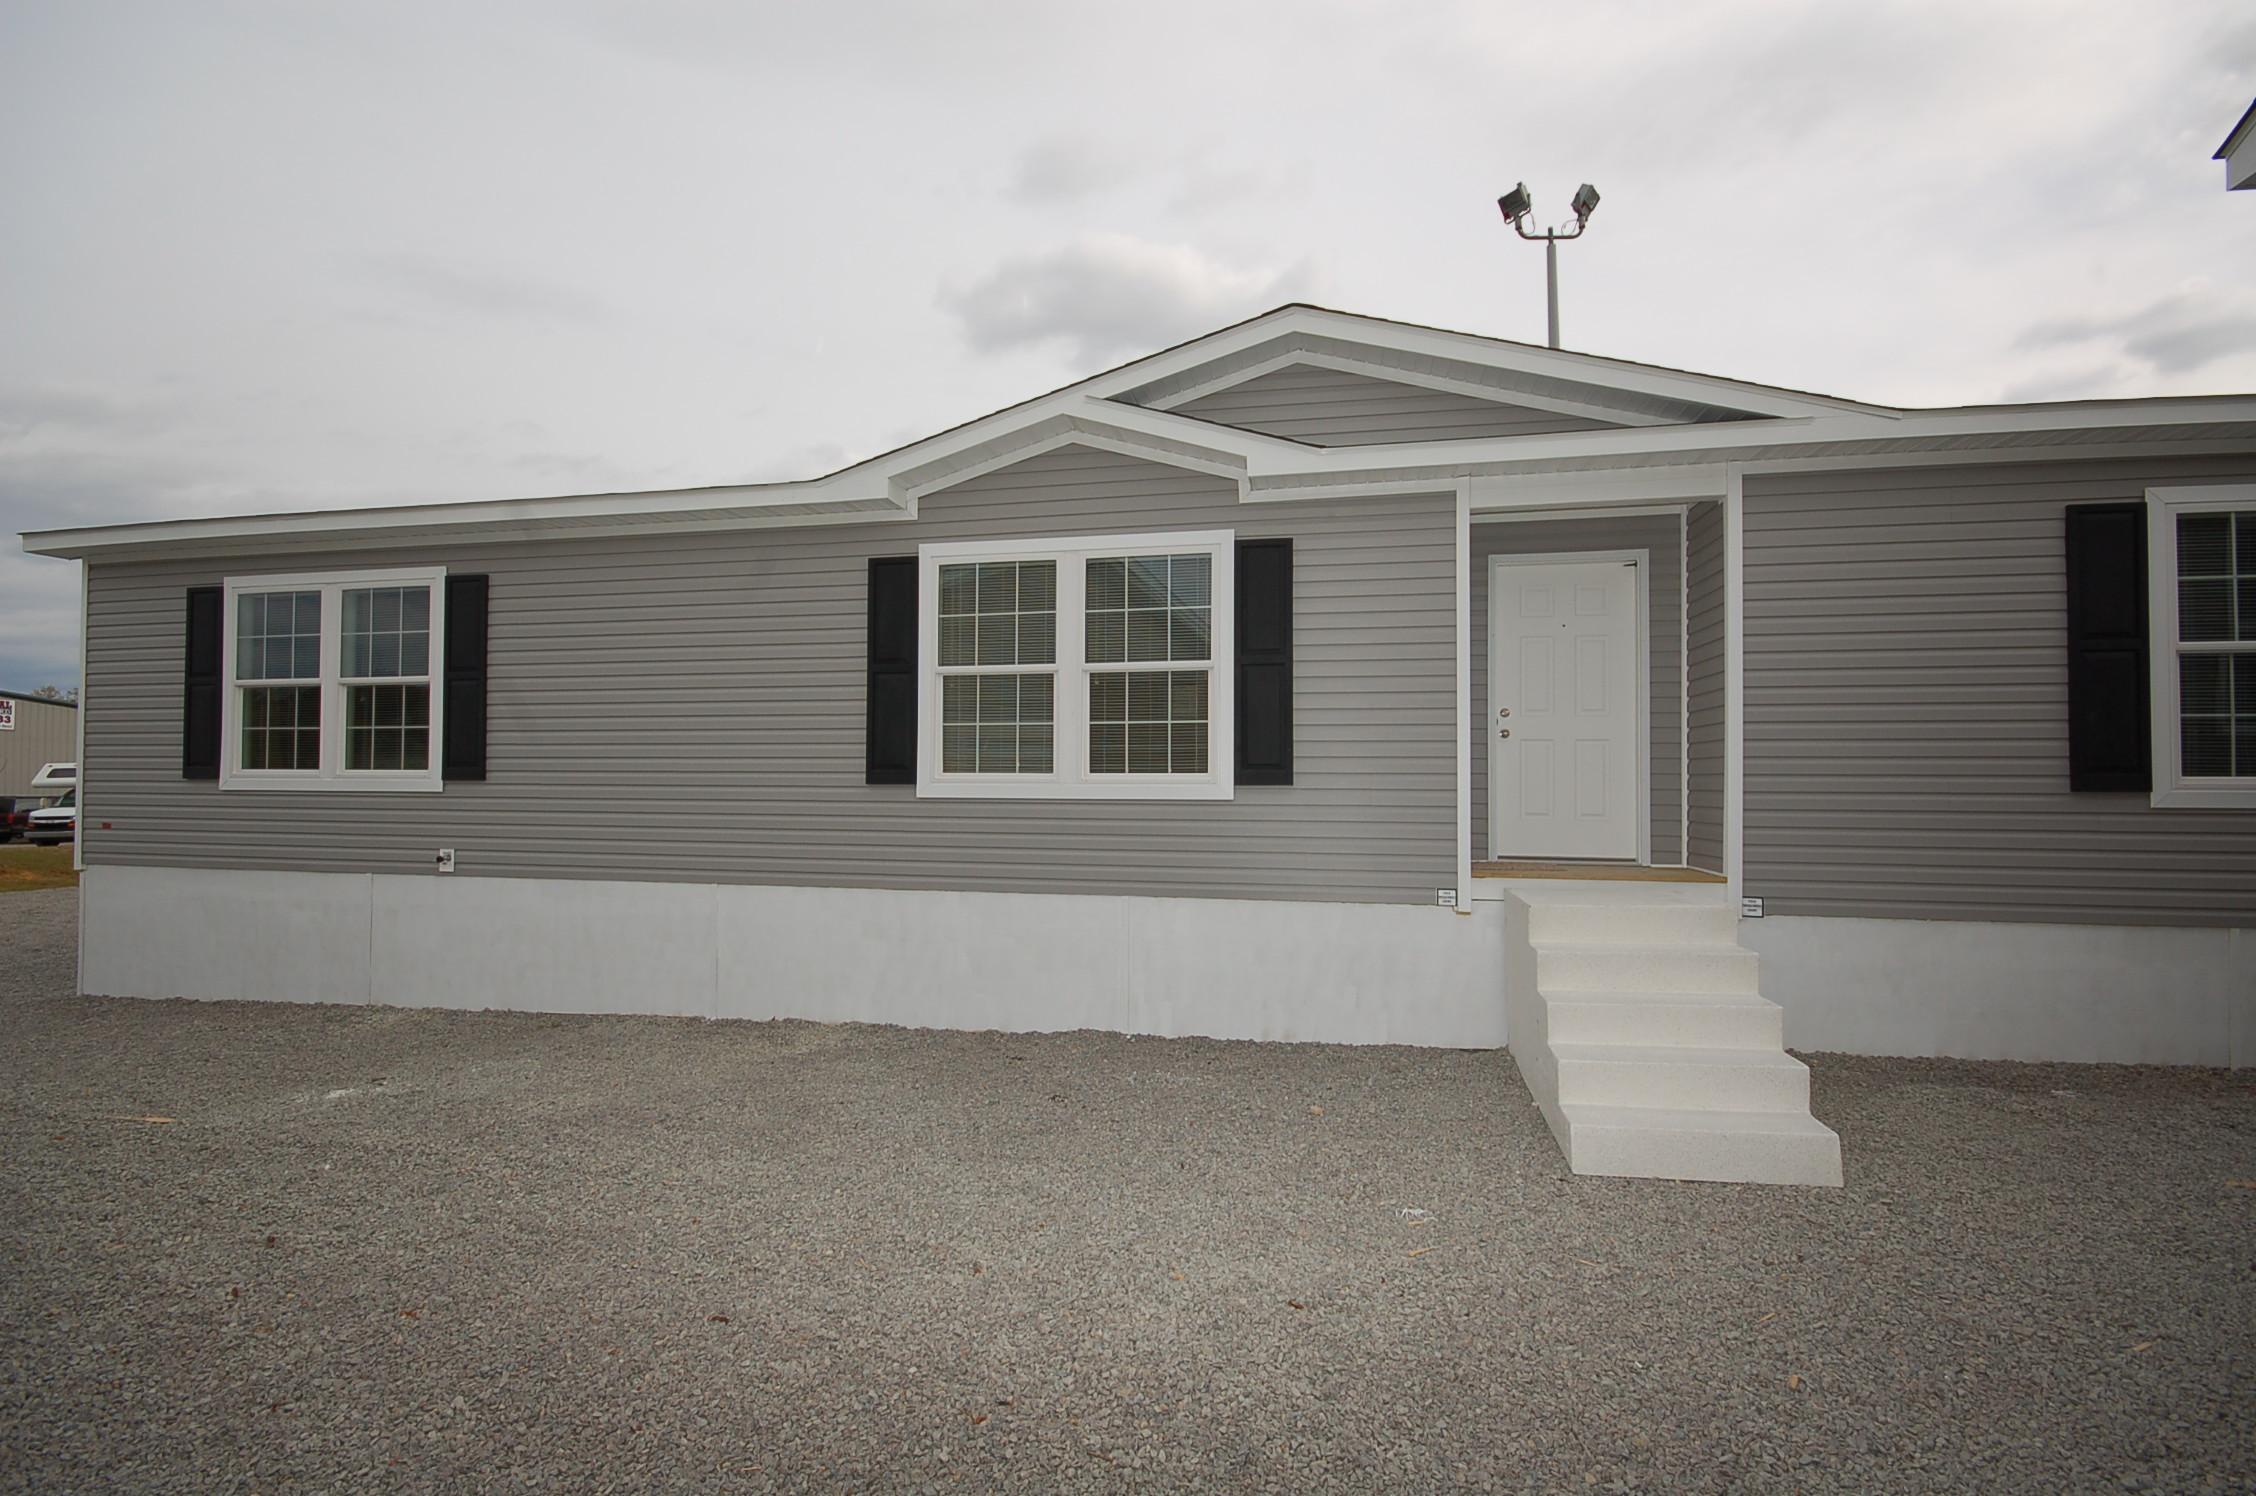 Modular homes dealers in goldsboro nc goldsboro north for Home builders goldsboro nc